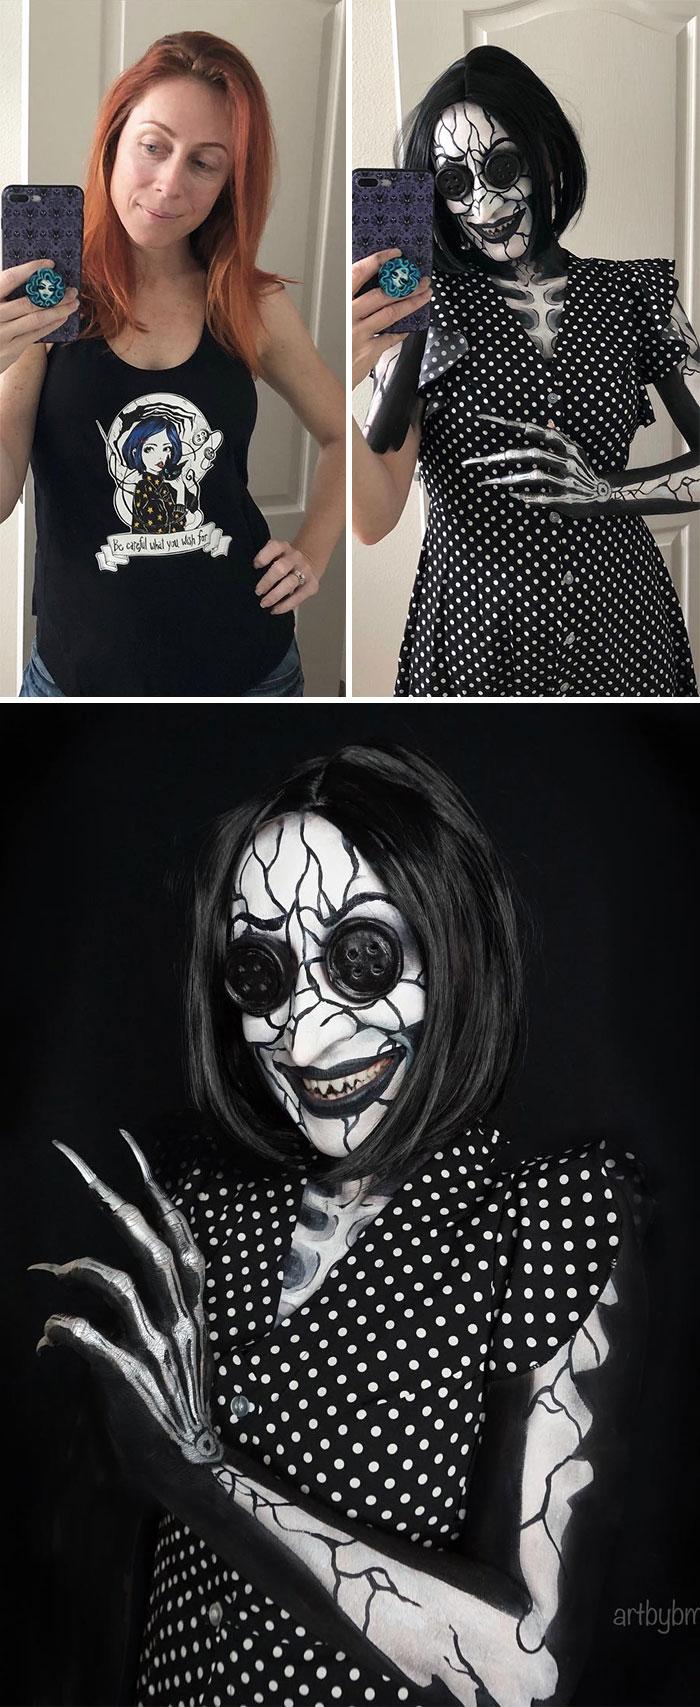 epic cosplays